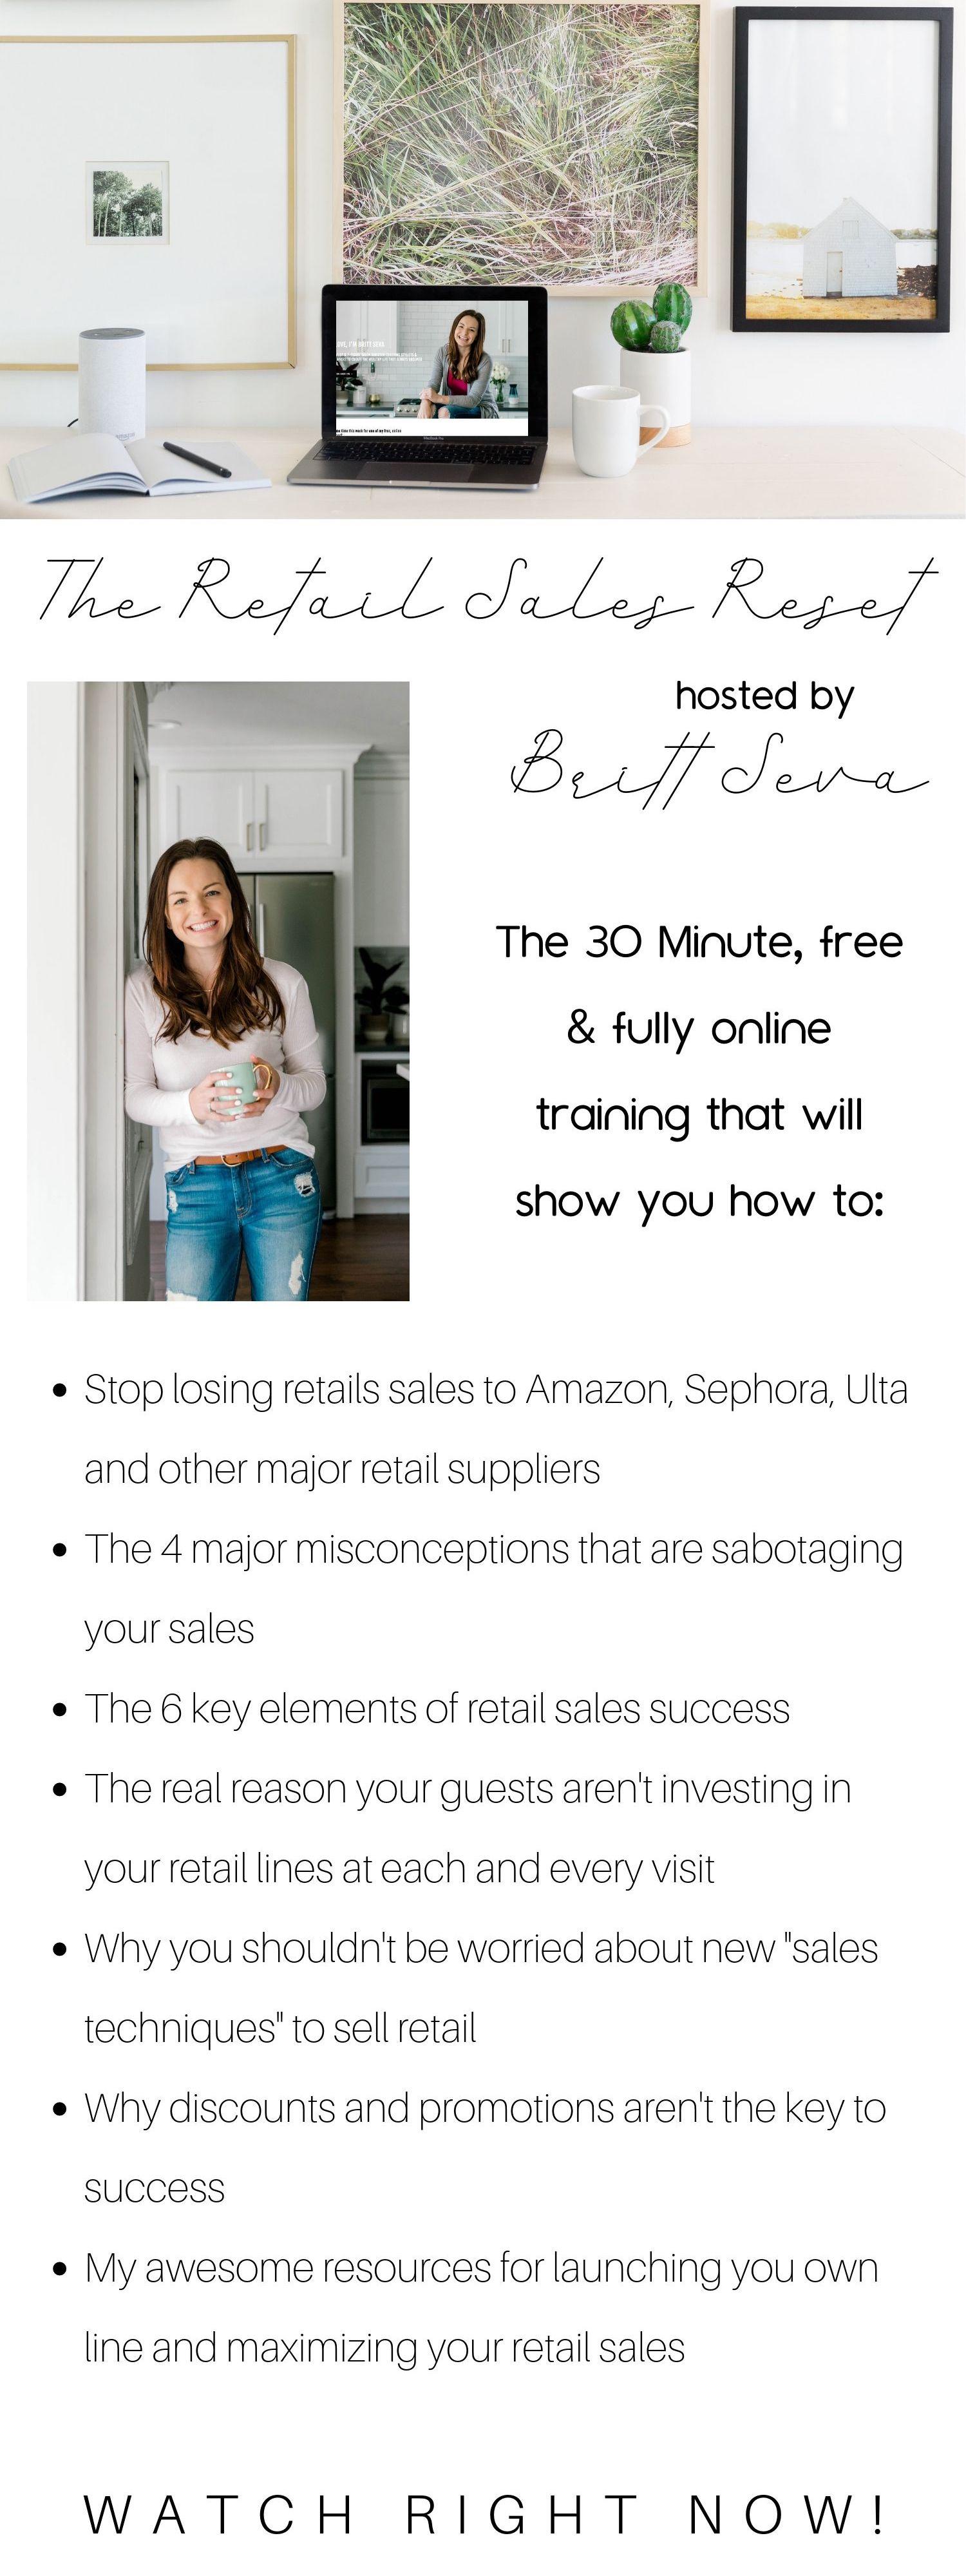 Copy of The Retail Sales Reset.jpg